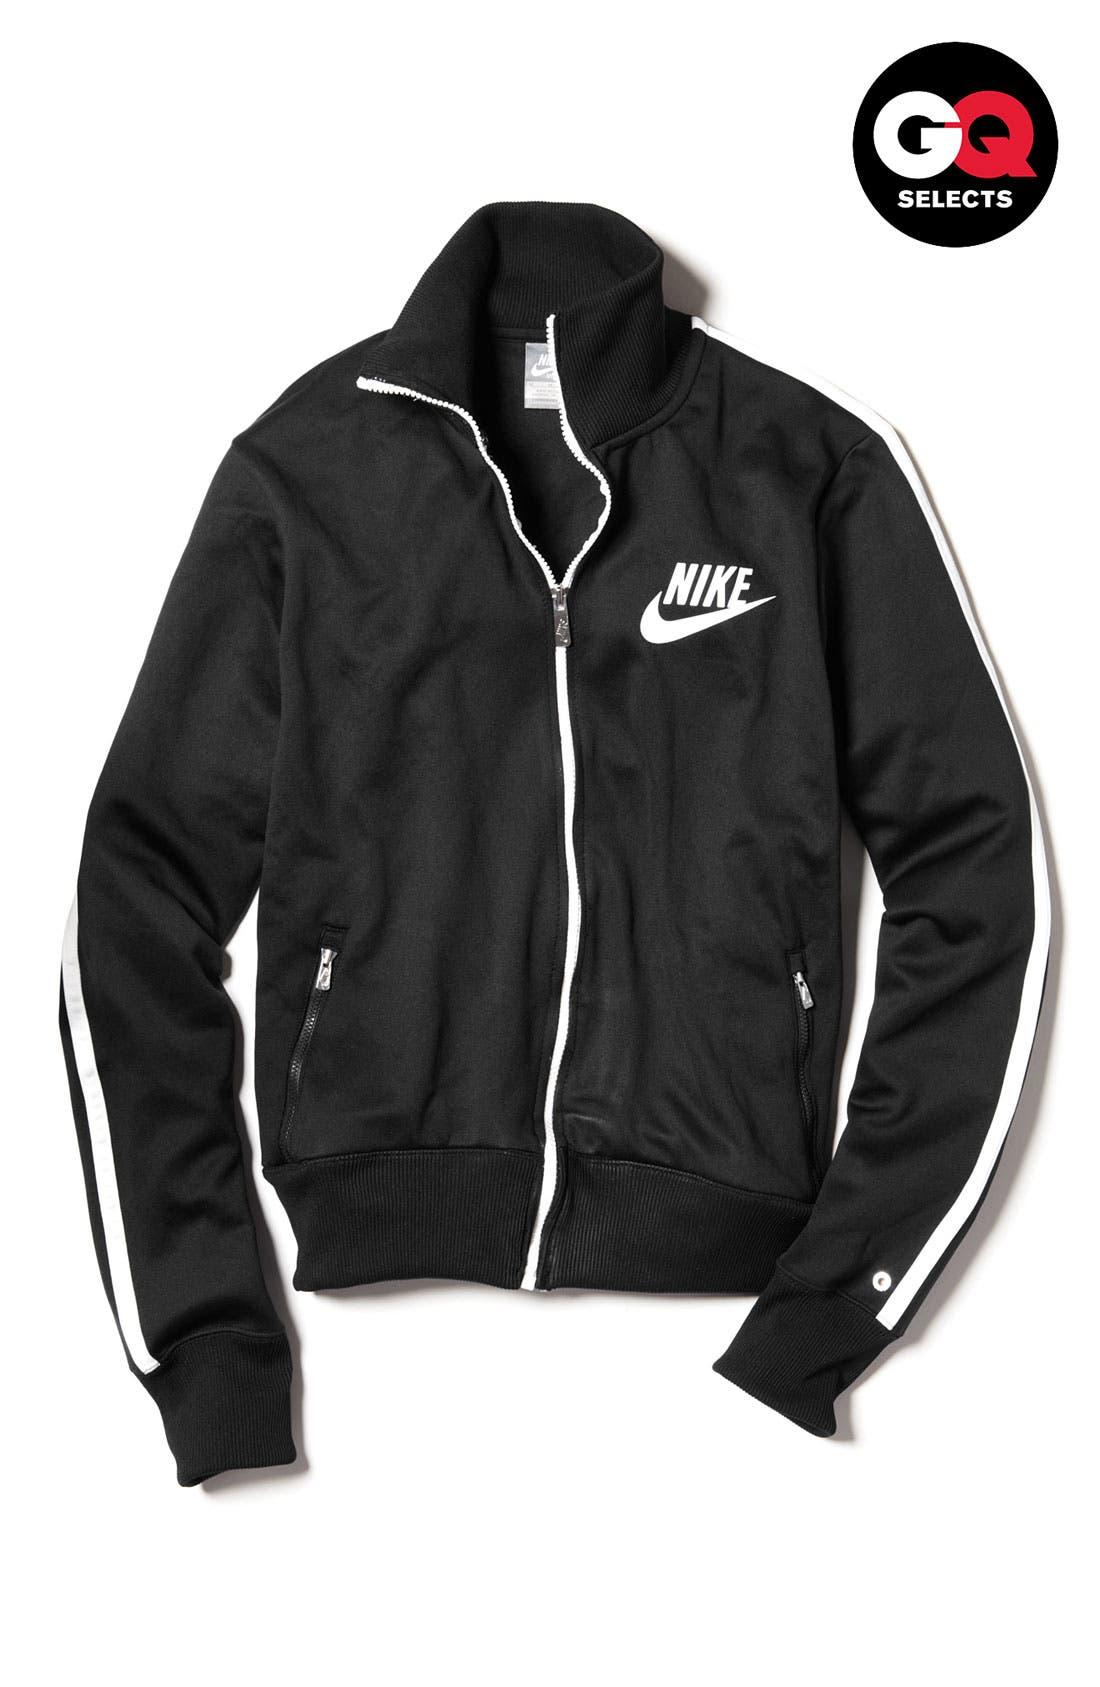 Main Image - Nike 'HBR' Track Jacket (Online Exclusive)